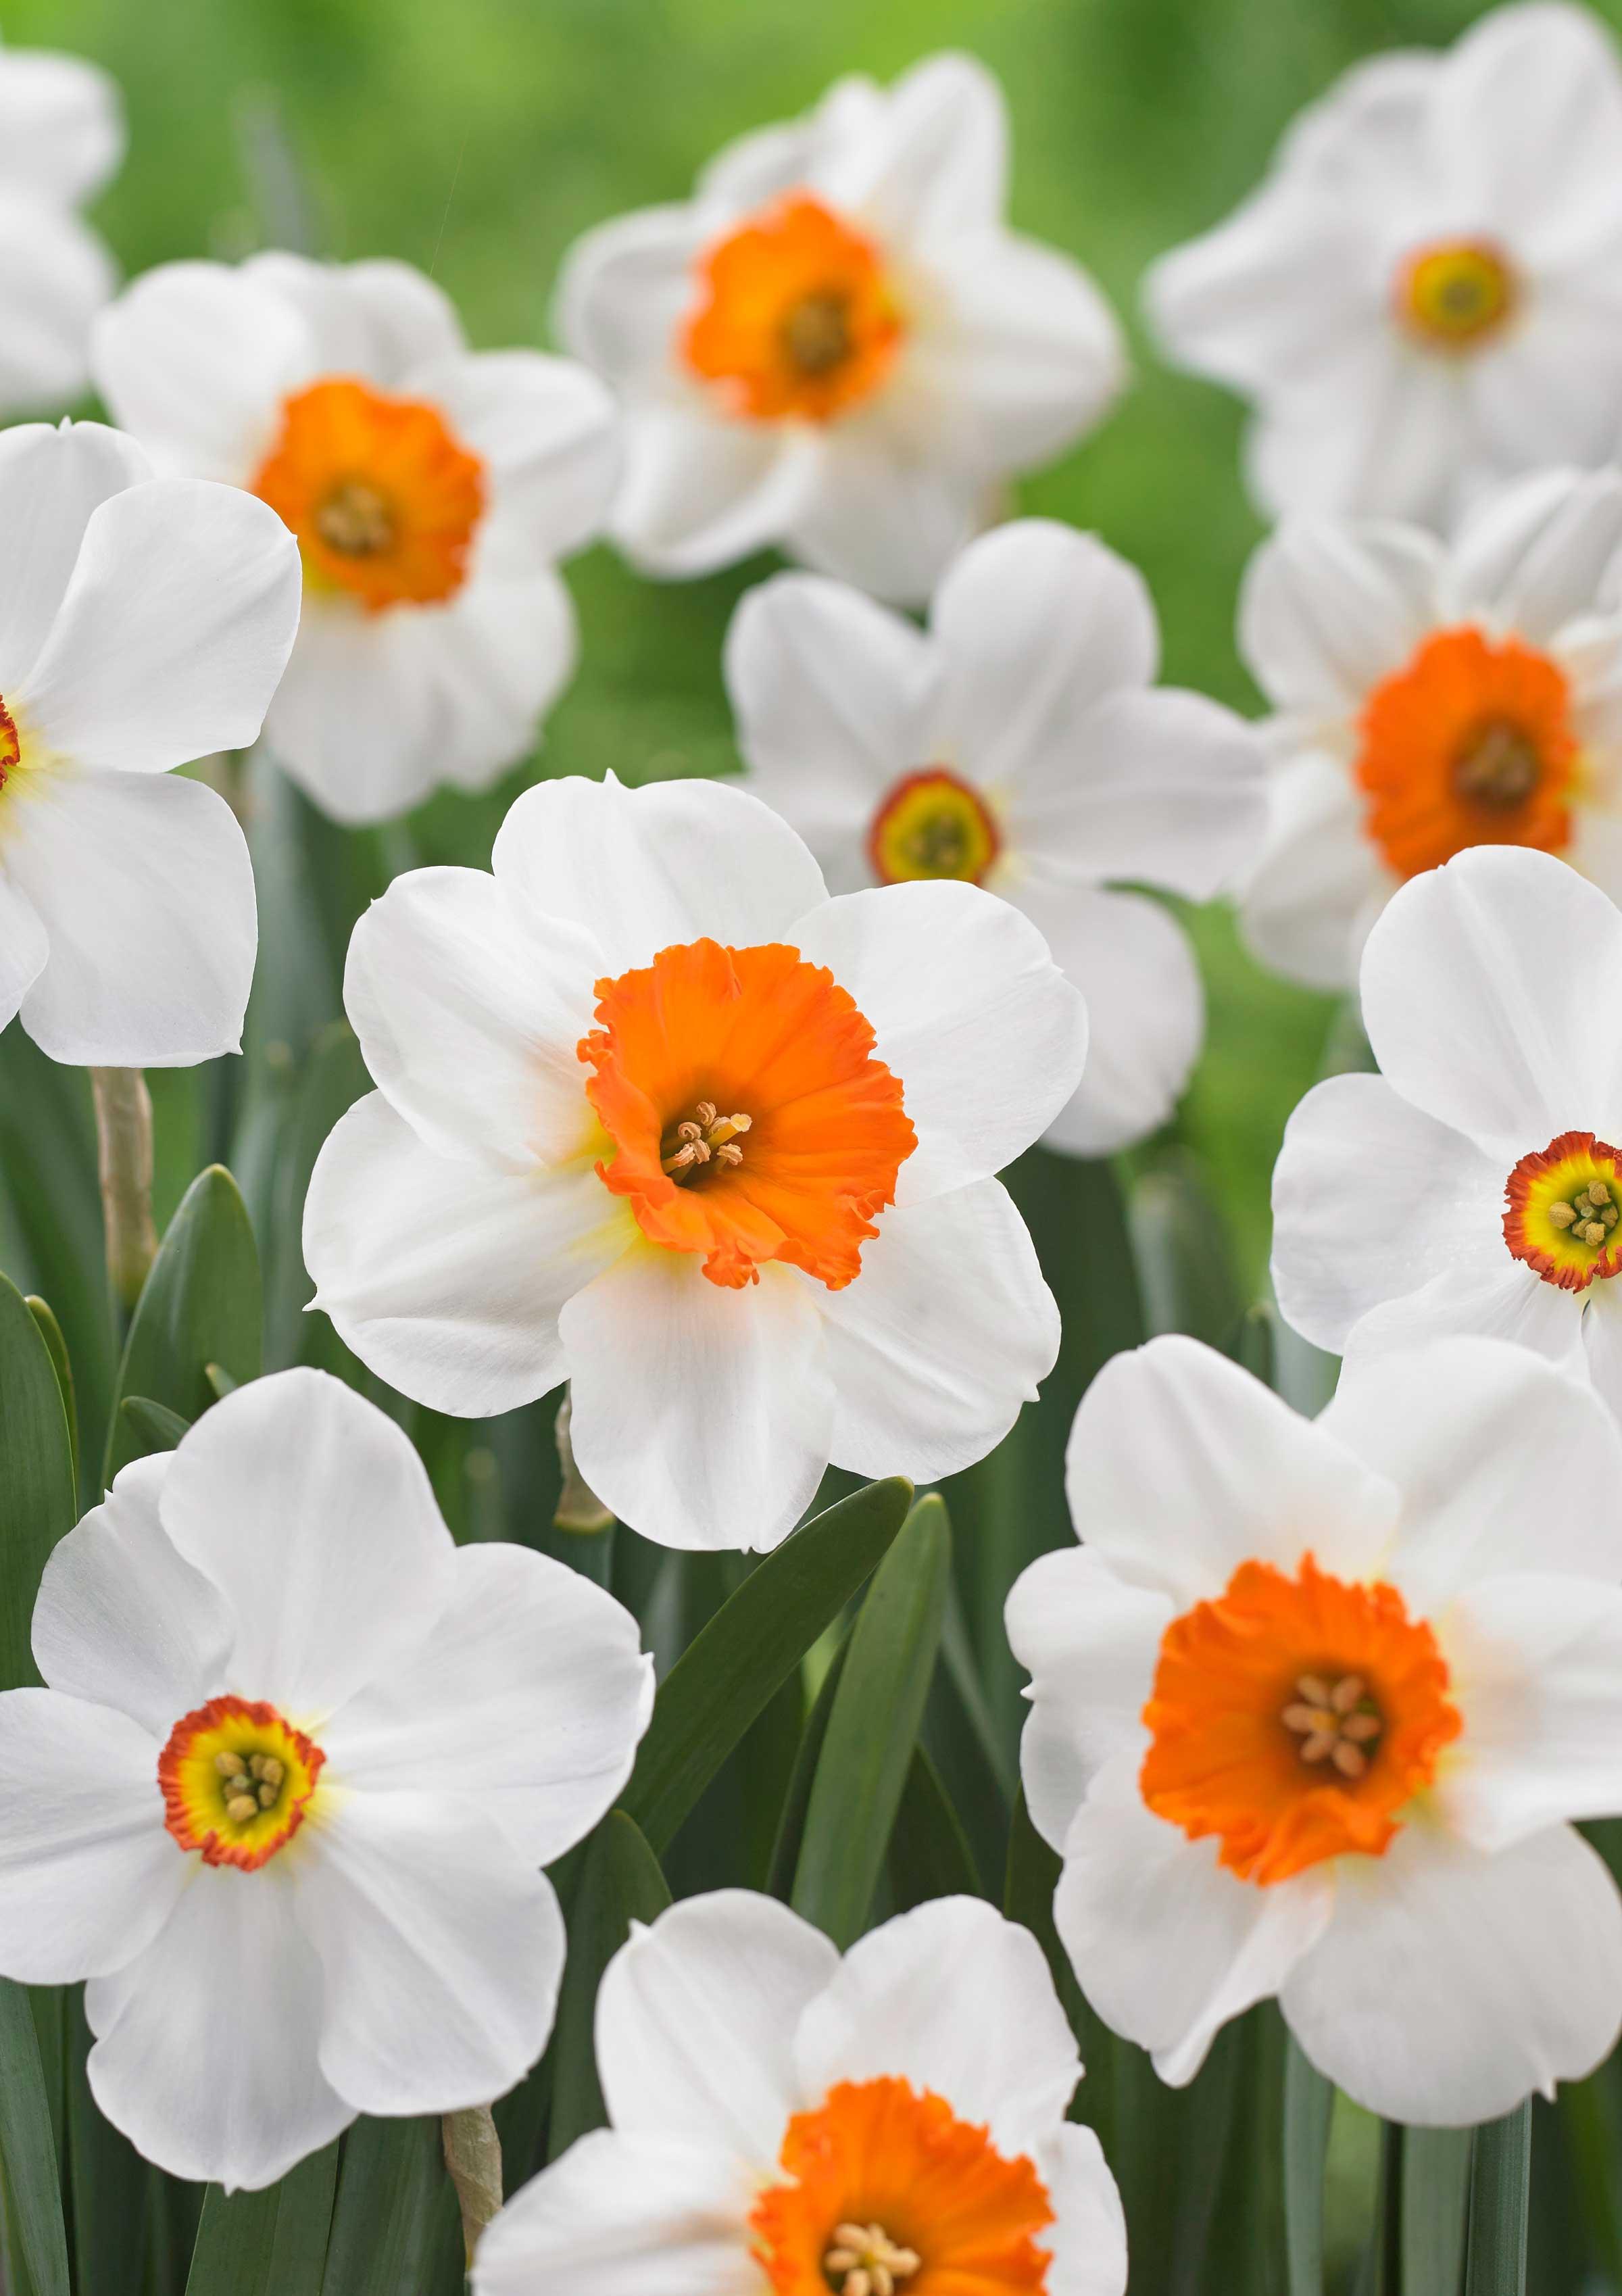 Daffodil-Barrett-Browning—Longfield-Gardens